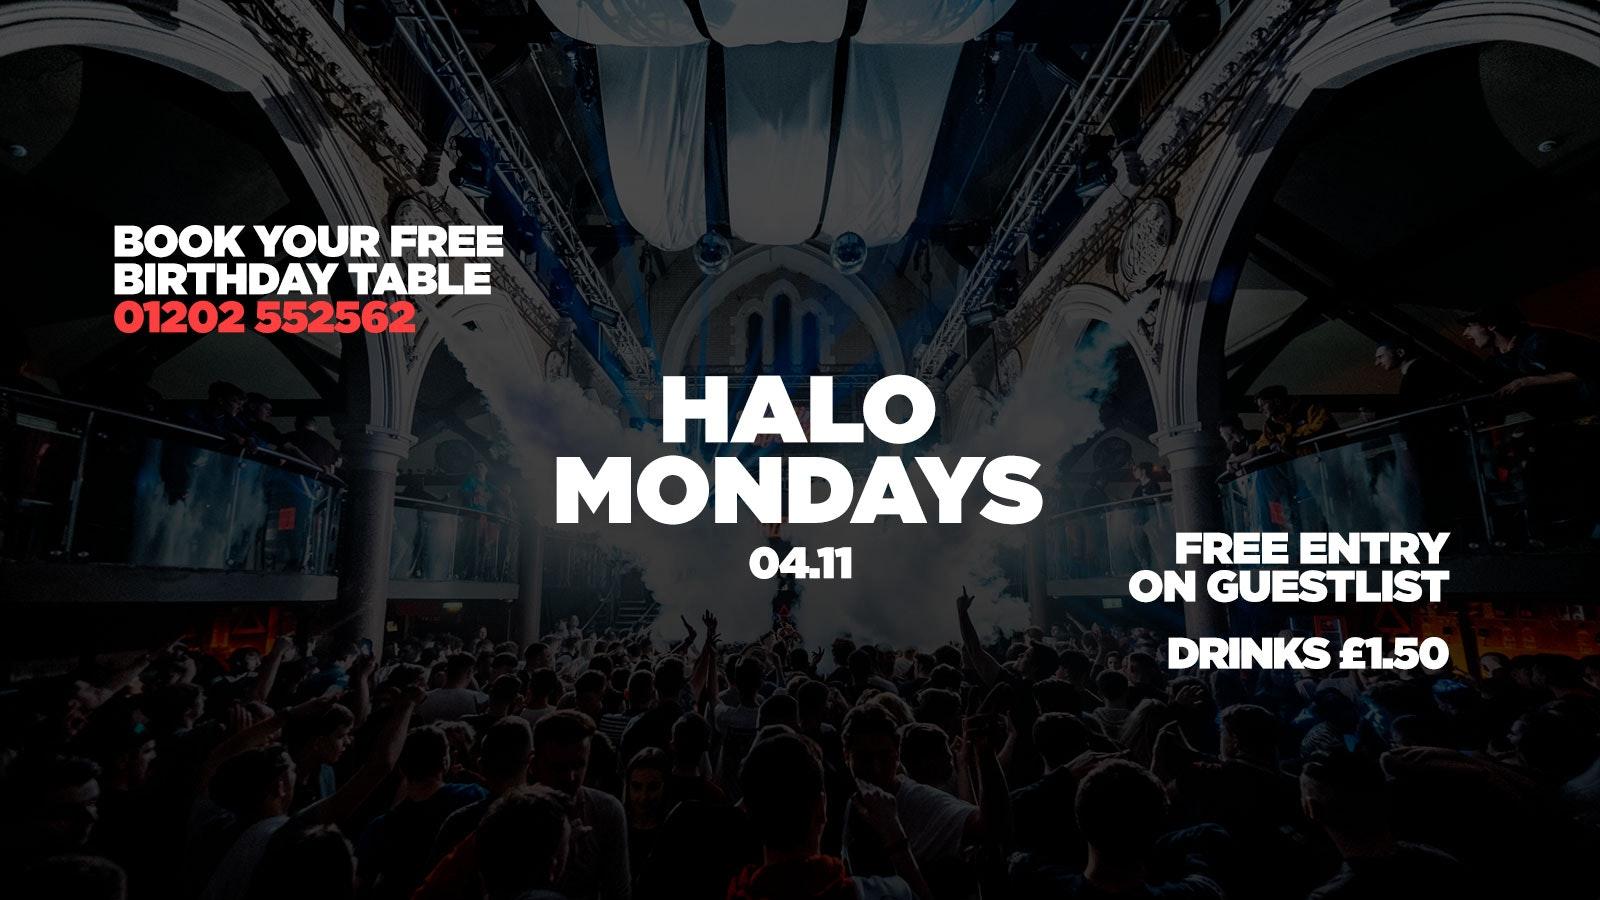 Halo Mondays 04.11 //// Drinks from £1.50 – Bournemouth's Biggest Student Night // Bournemouth Freshers